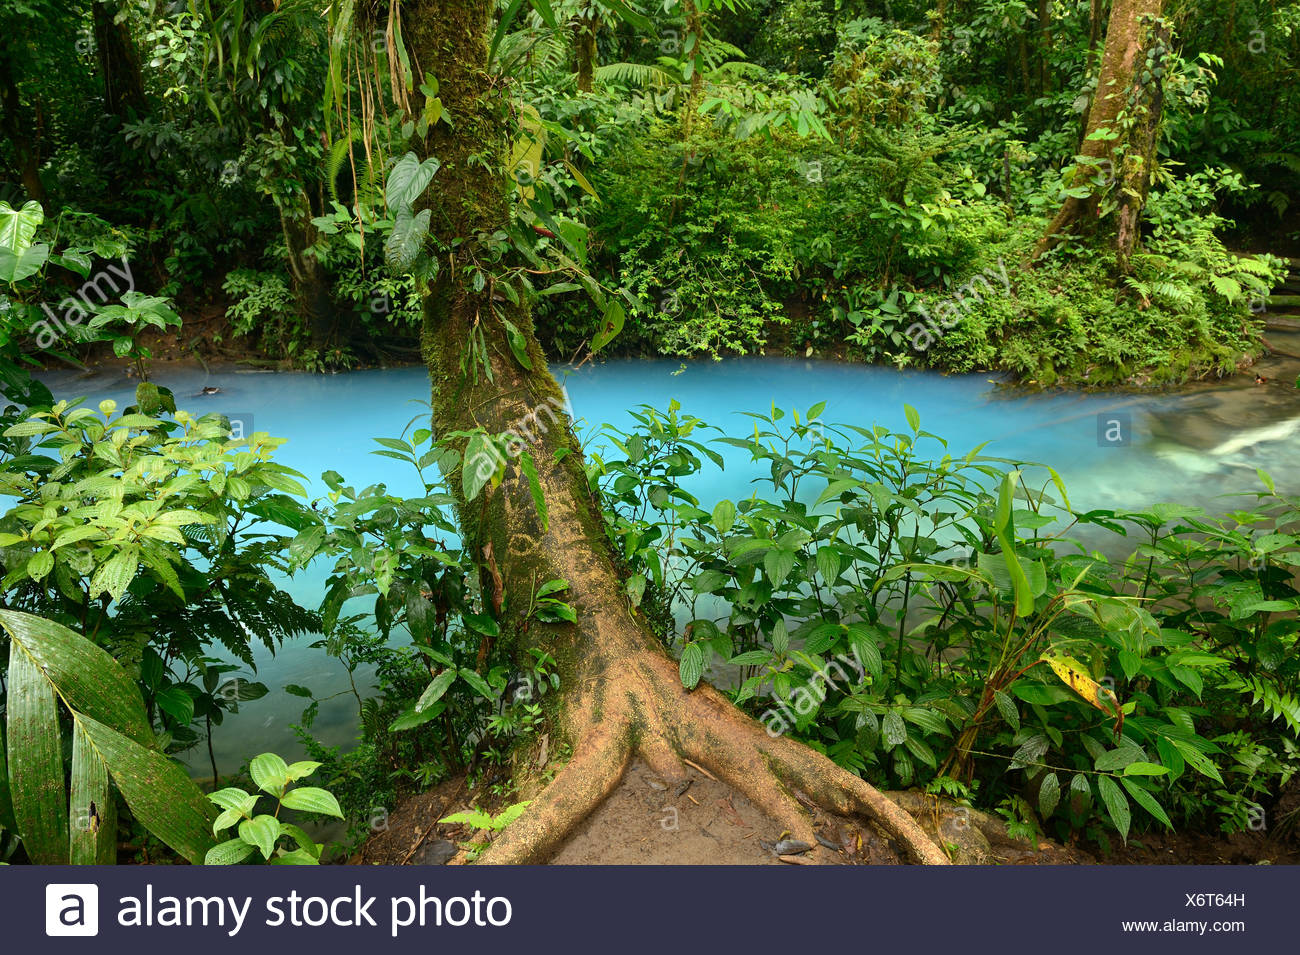 Tree covered in bromeliads protruding into the Rio Celeste, Tenorio Volcano National Park, Costa Rica, Central America - Stock Image